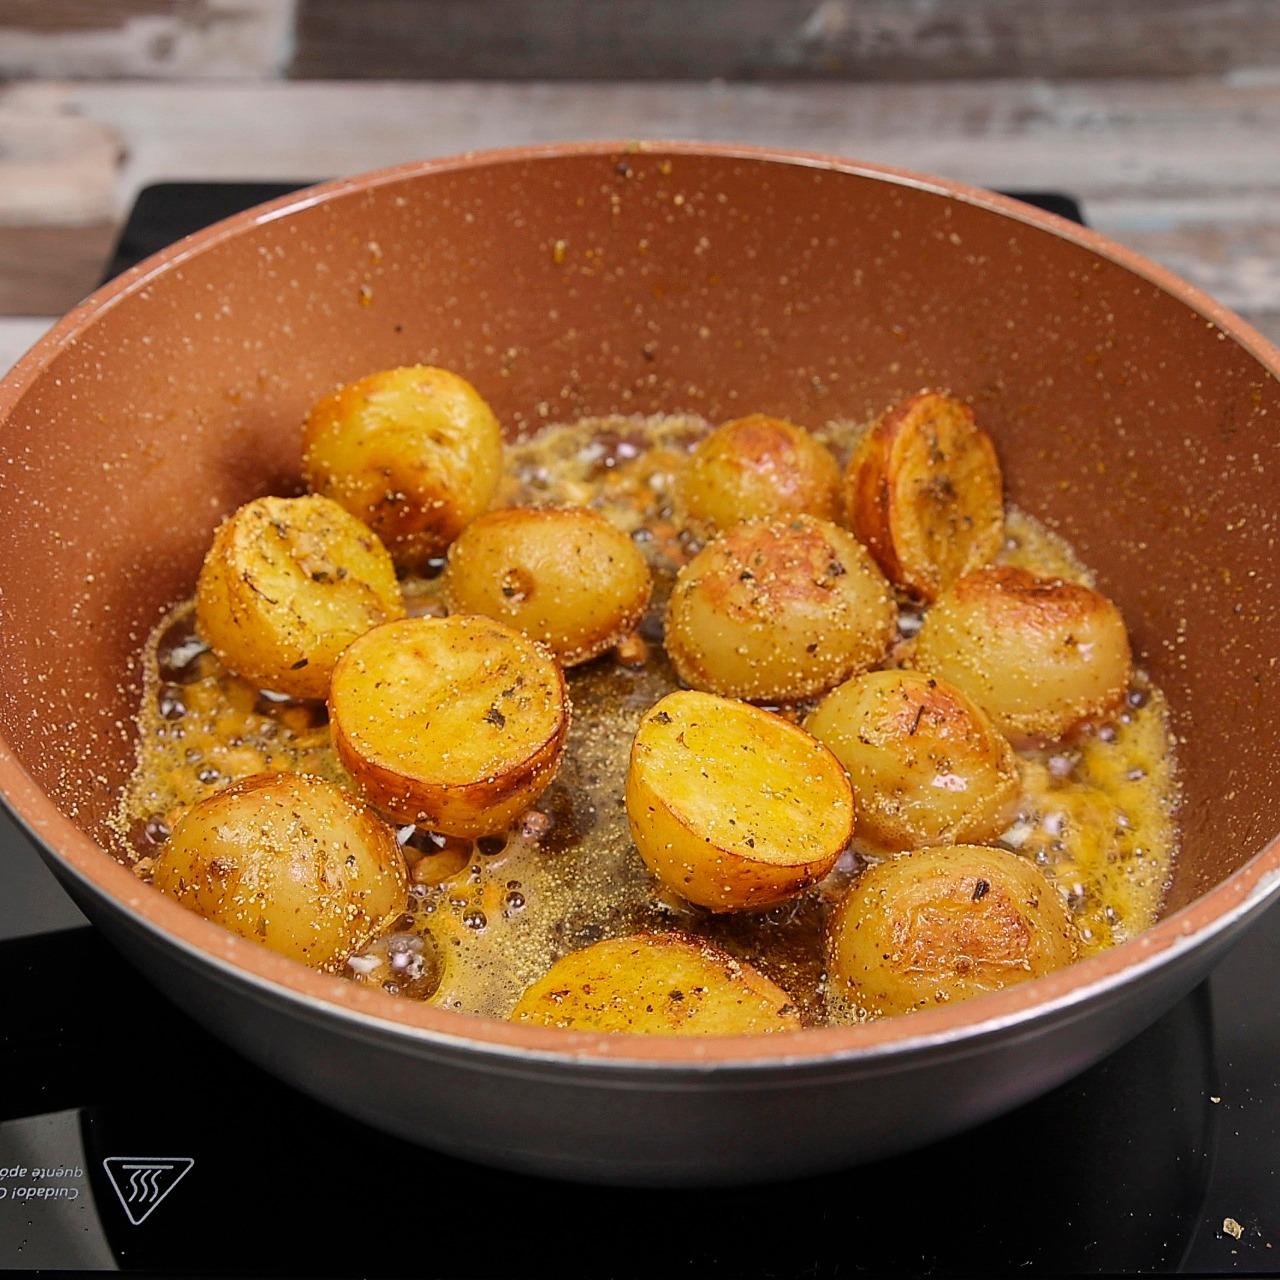 Batata Rústica Fácil de Fazer de Deliciosa!